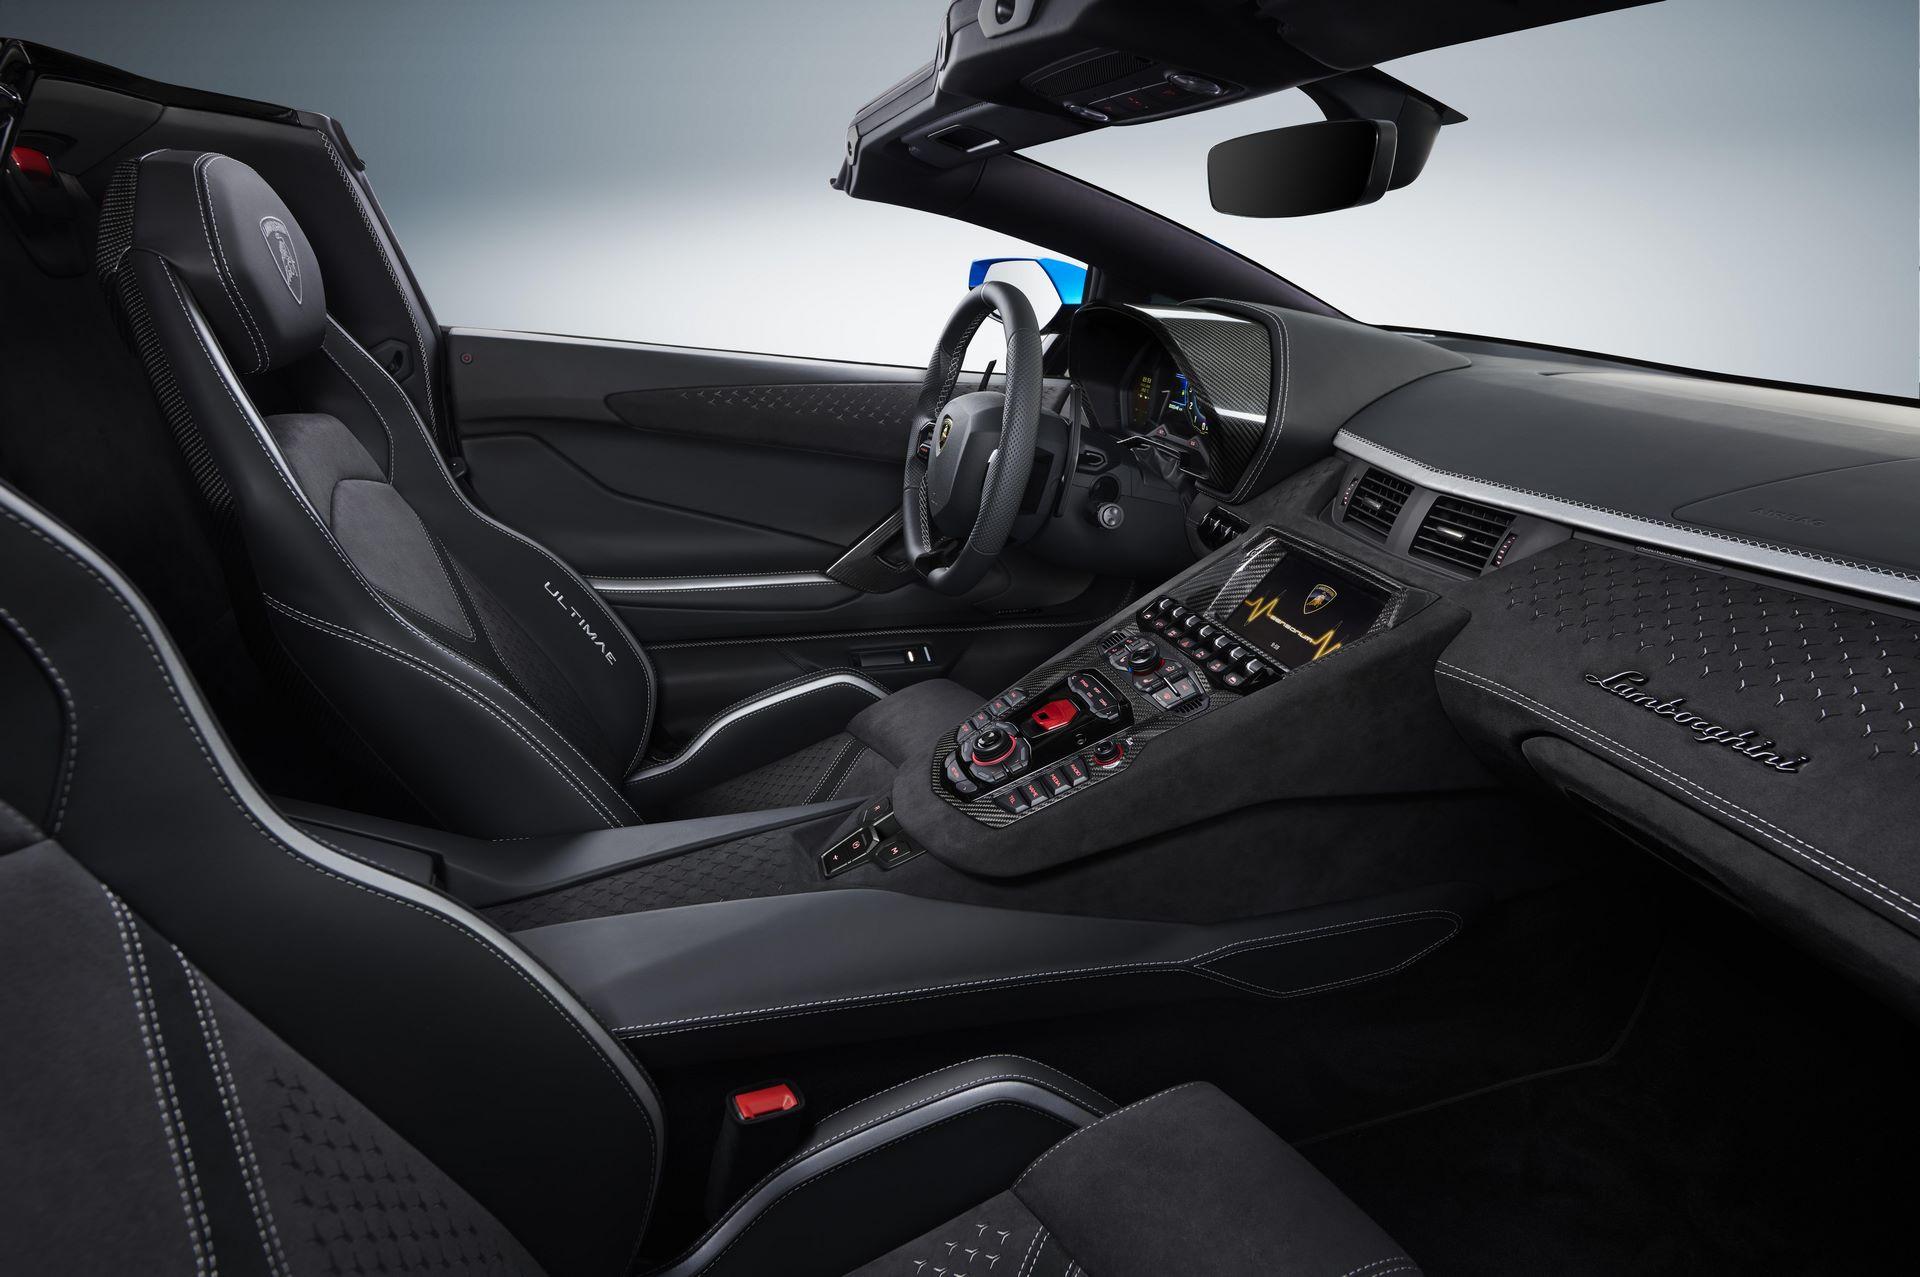 Lamborghini-Aventador-LP780-4-Ultimae-51